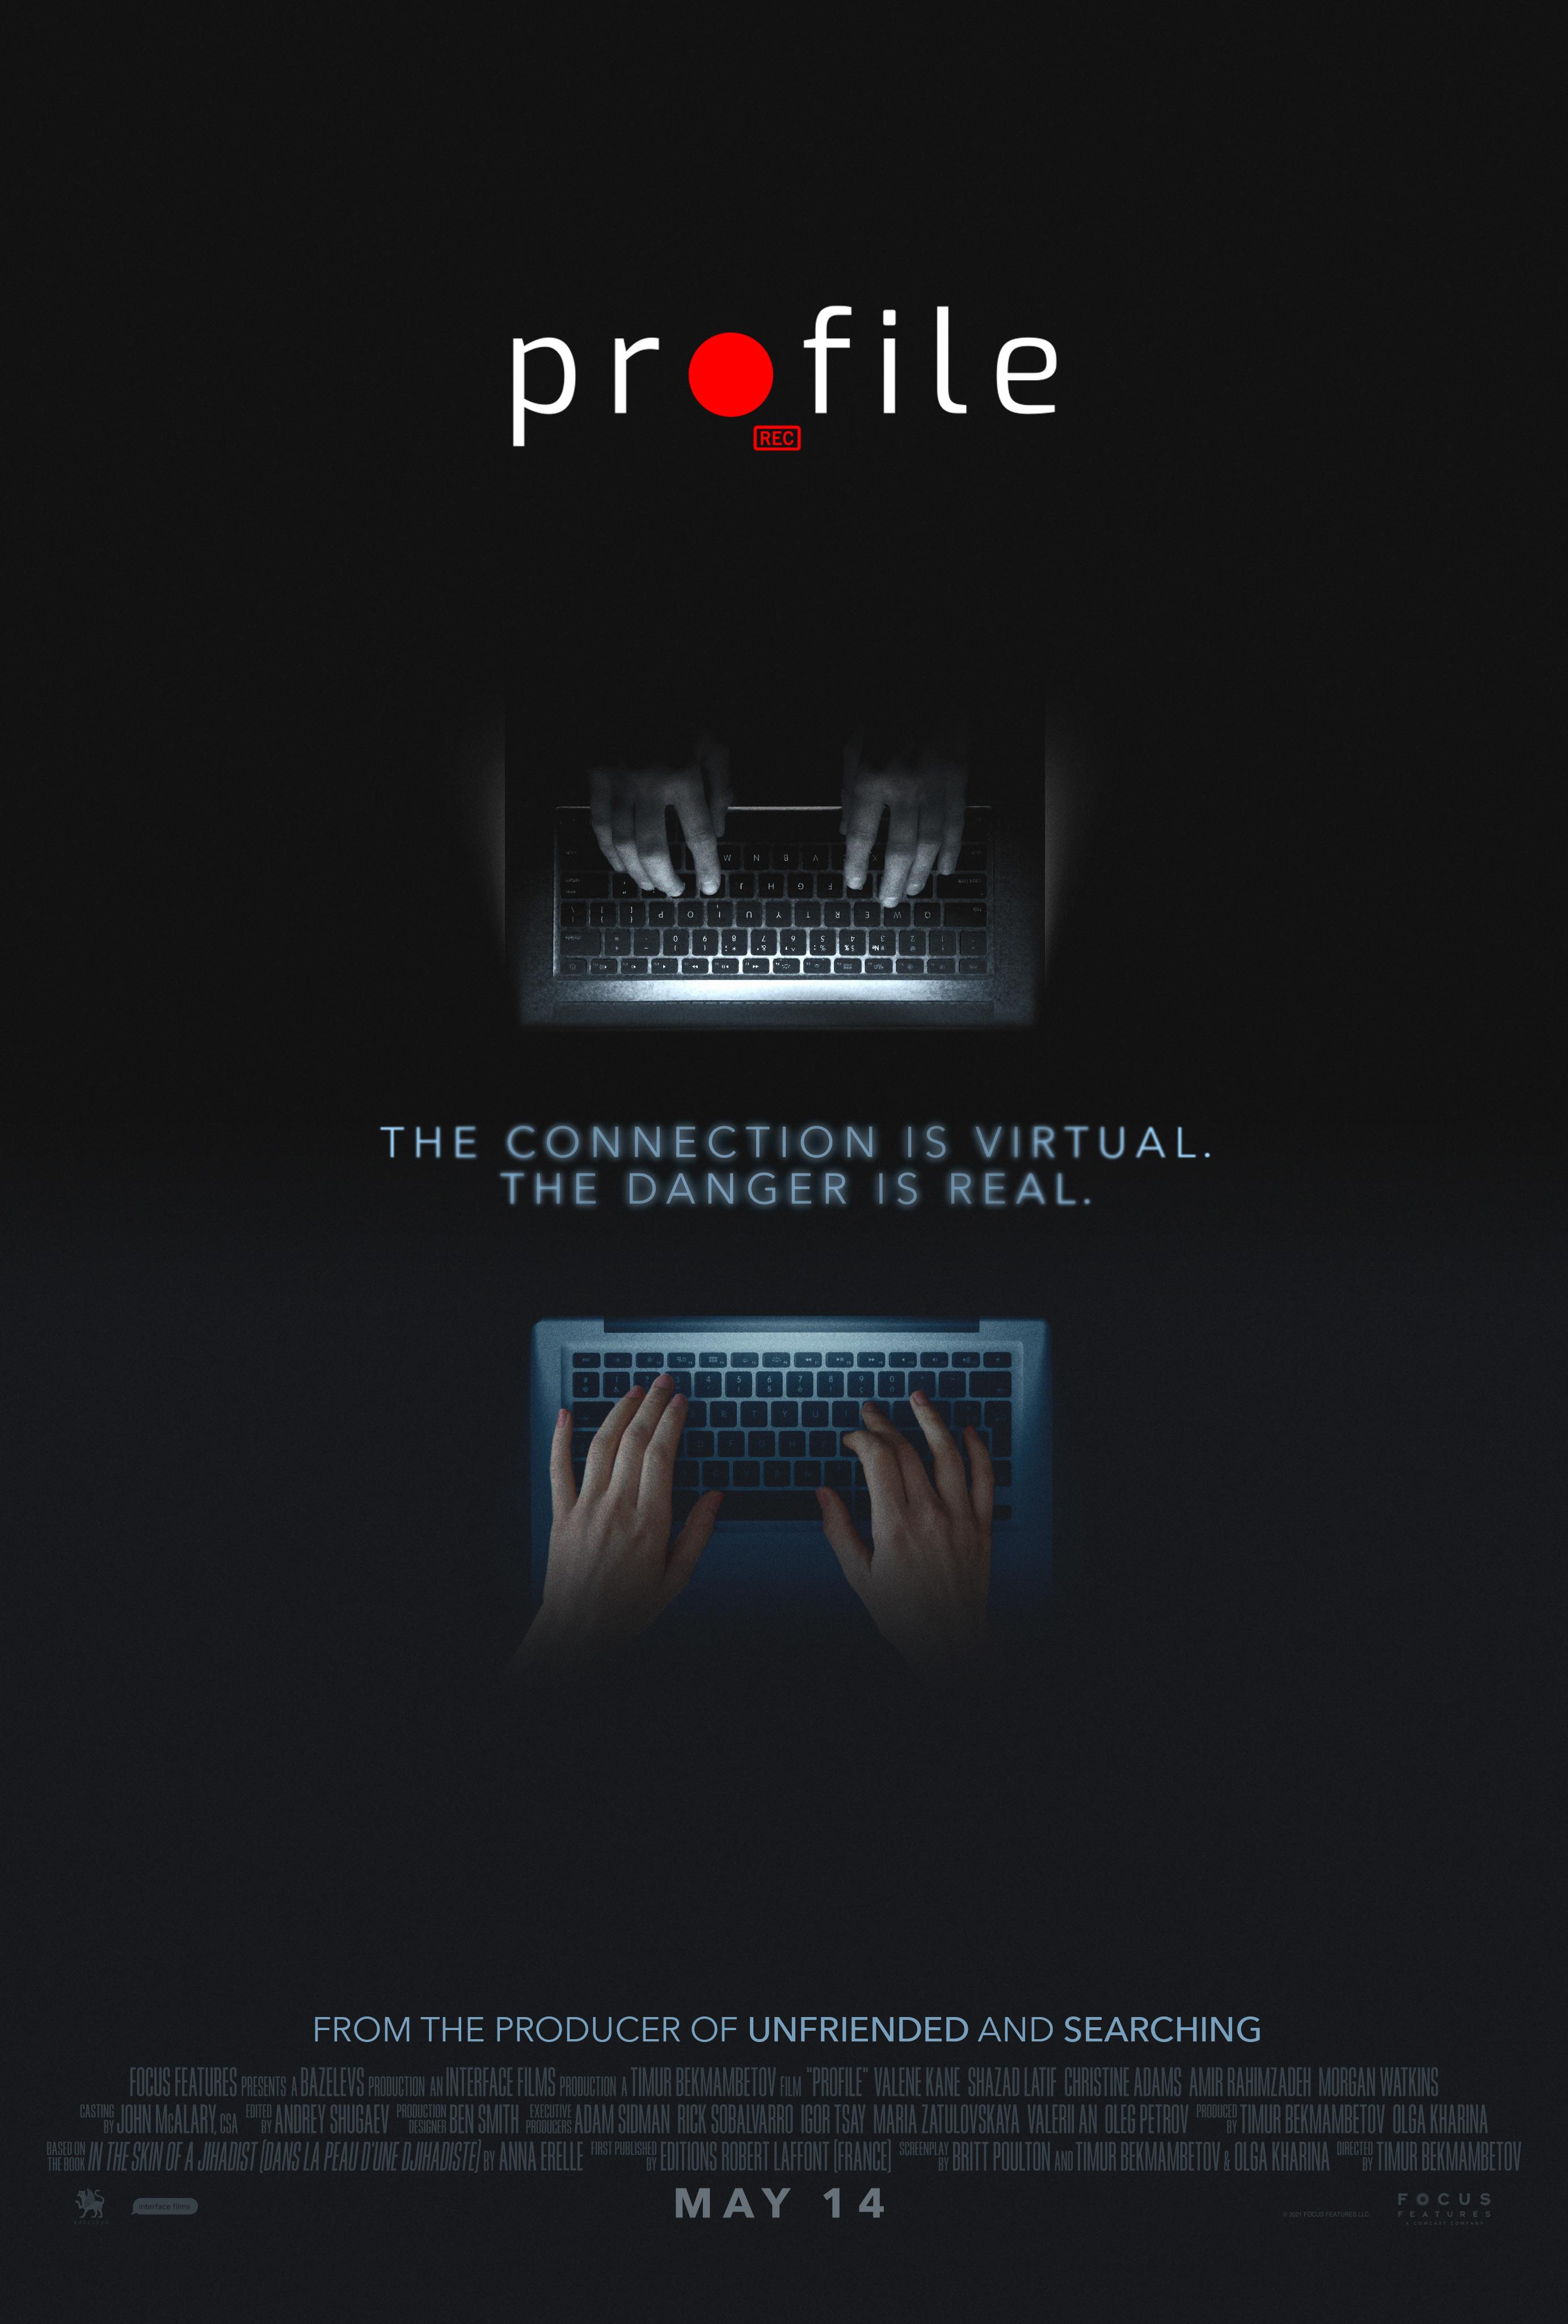 Download Filme Perfil Torrent 2021 Qualidade Hd